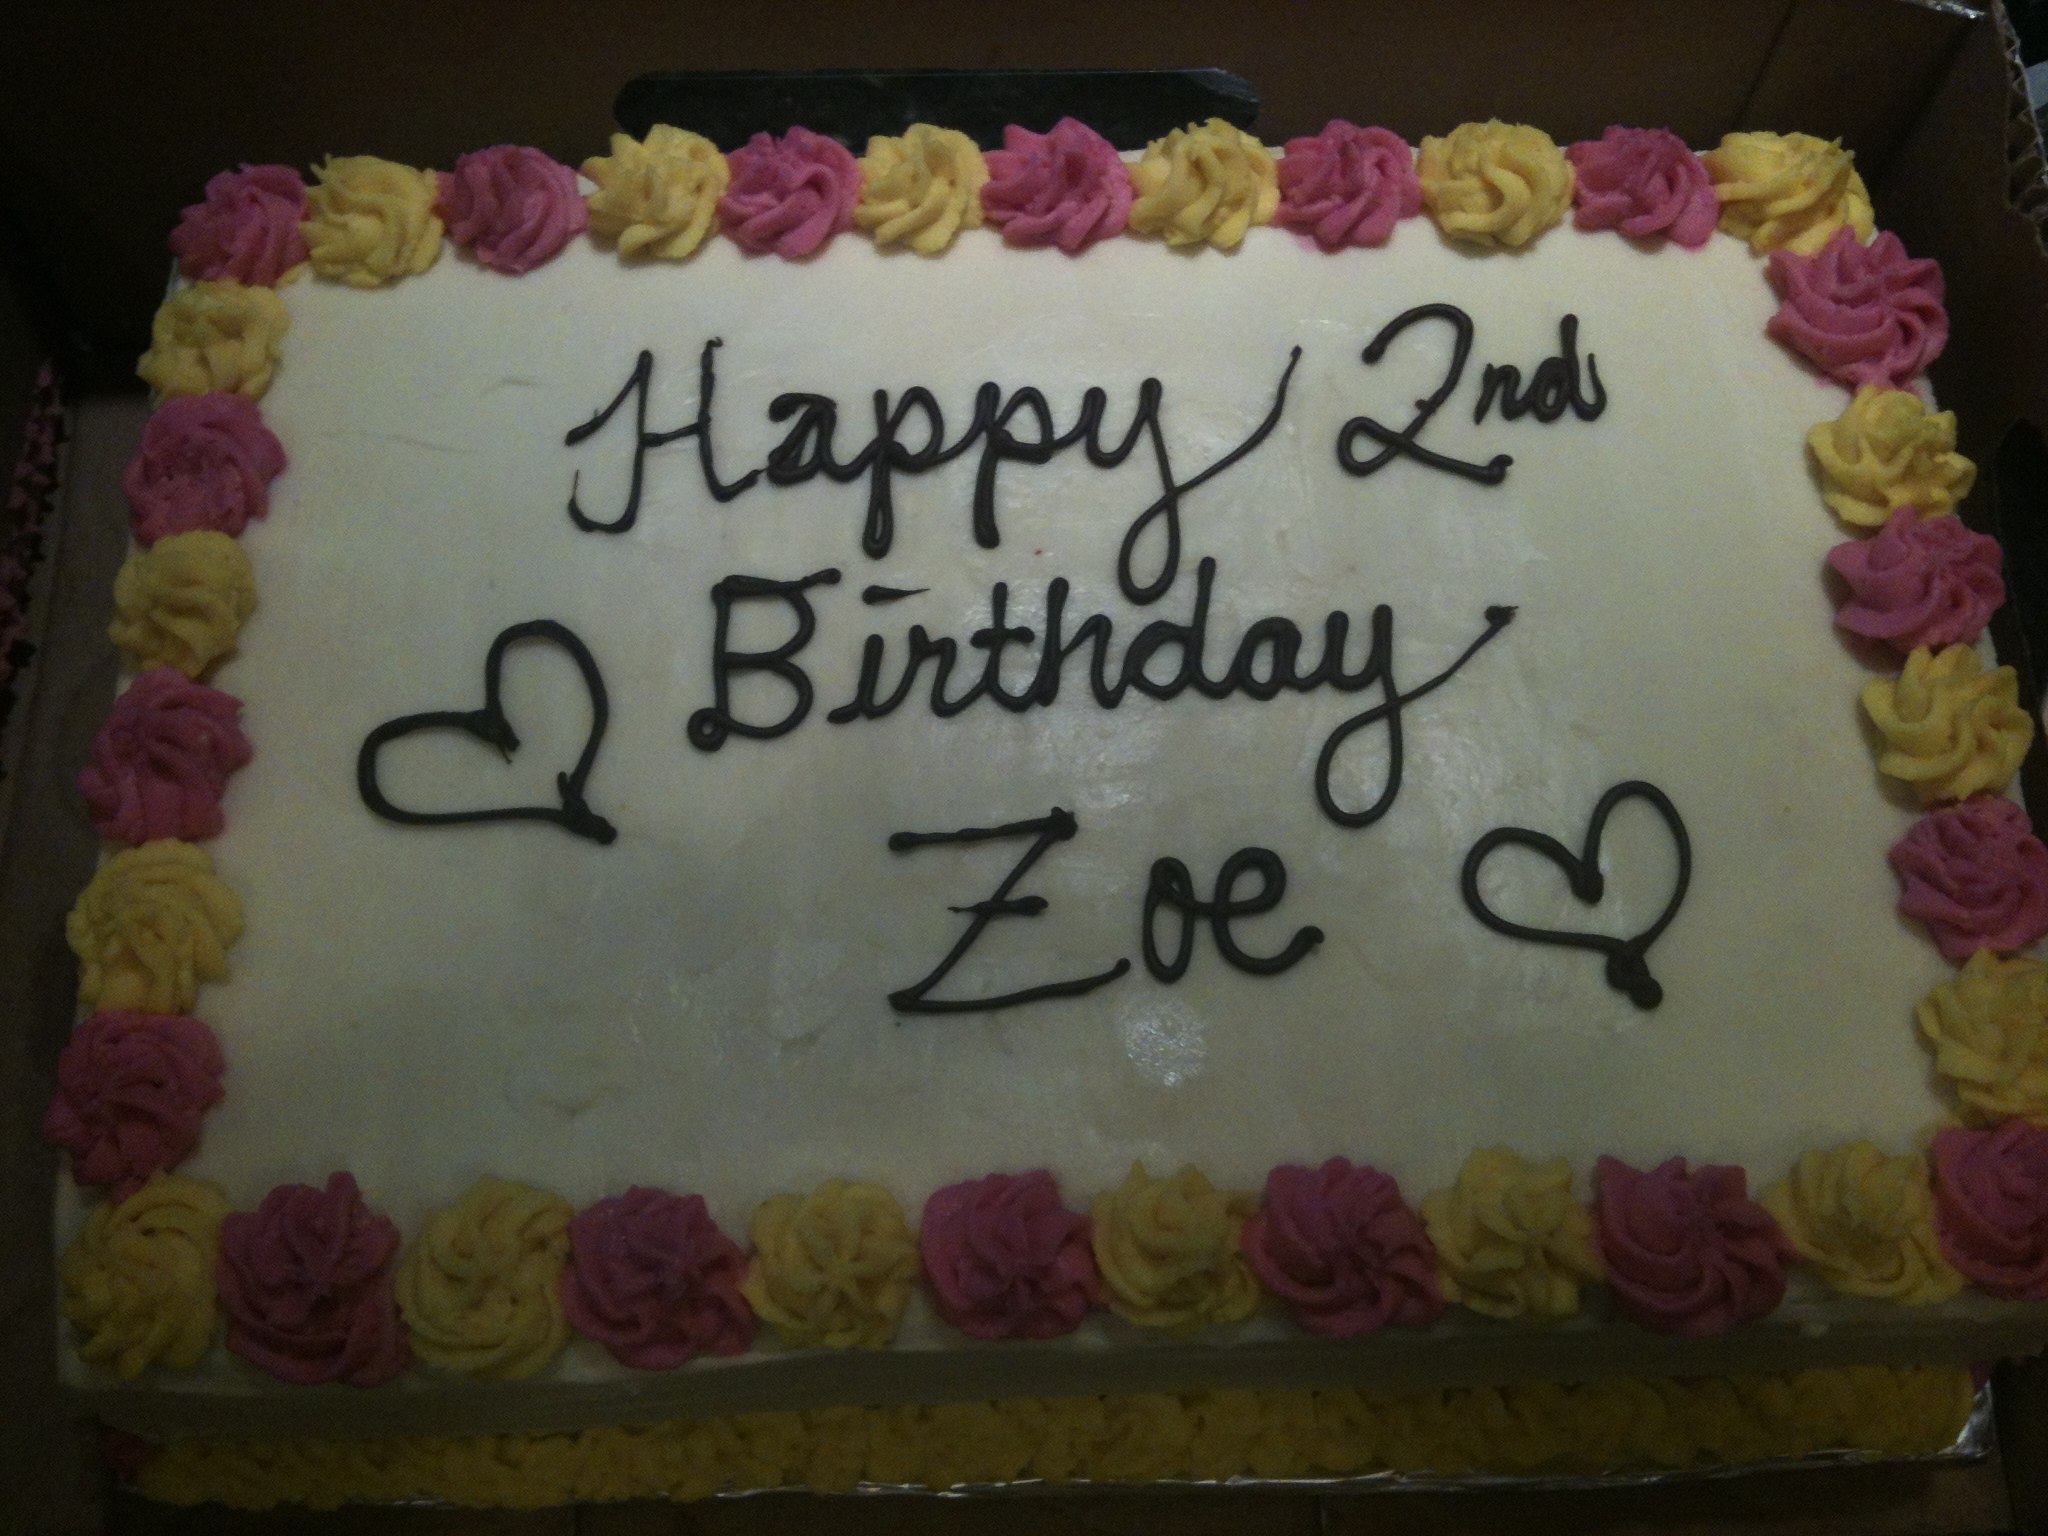 Naturally Colored Birthday Cake Frosting Thegourmom